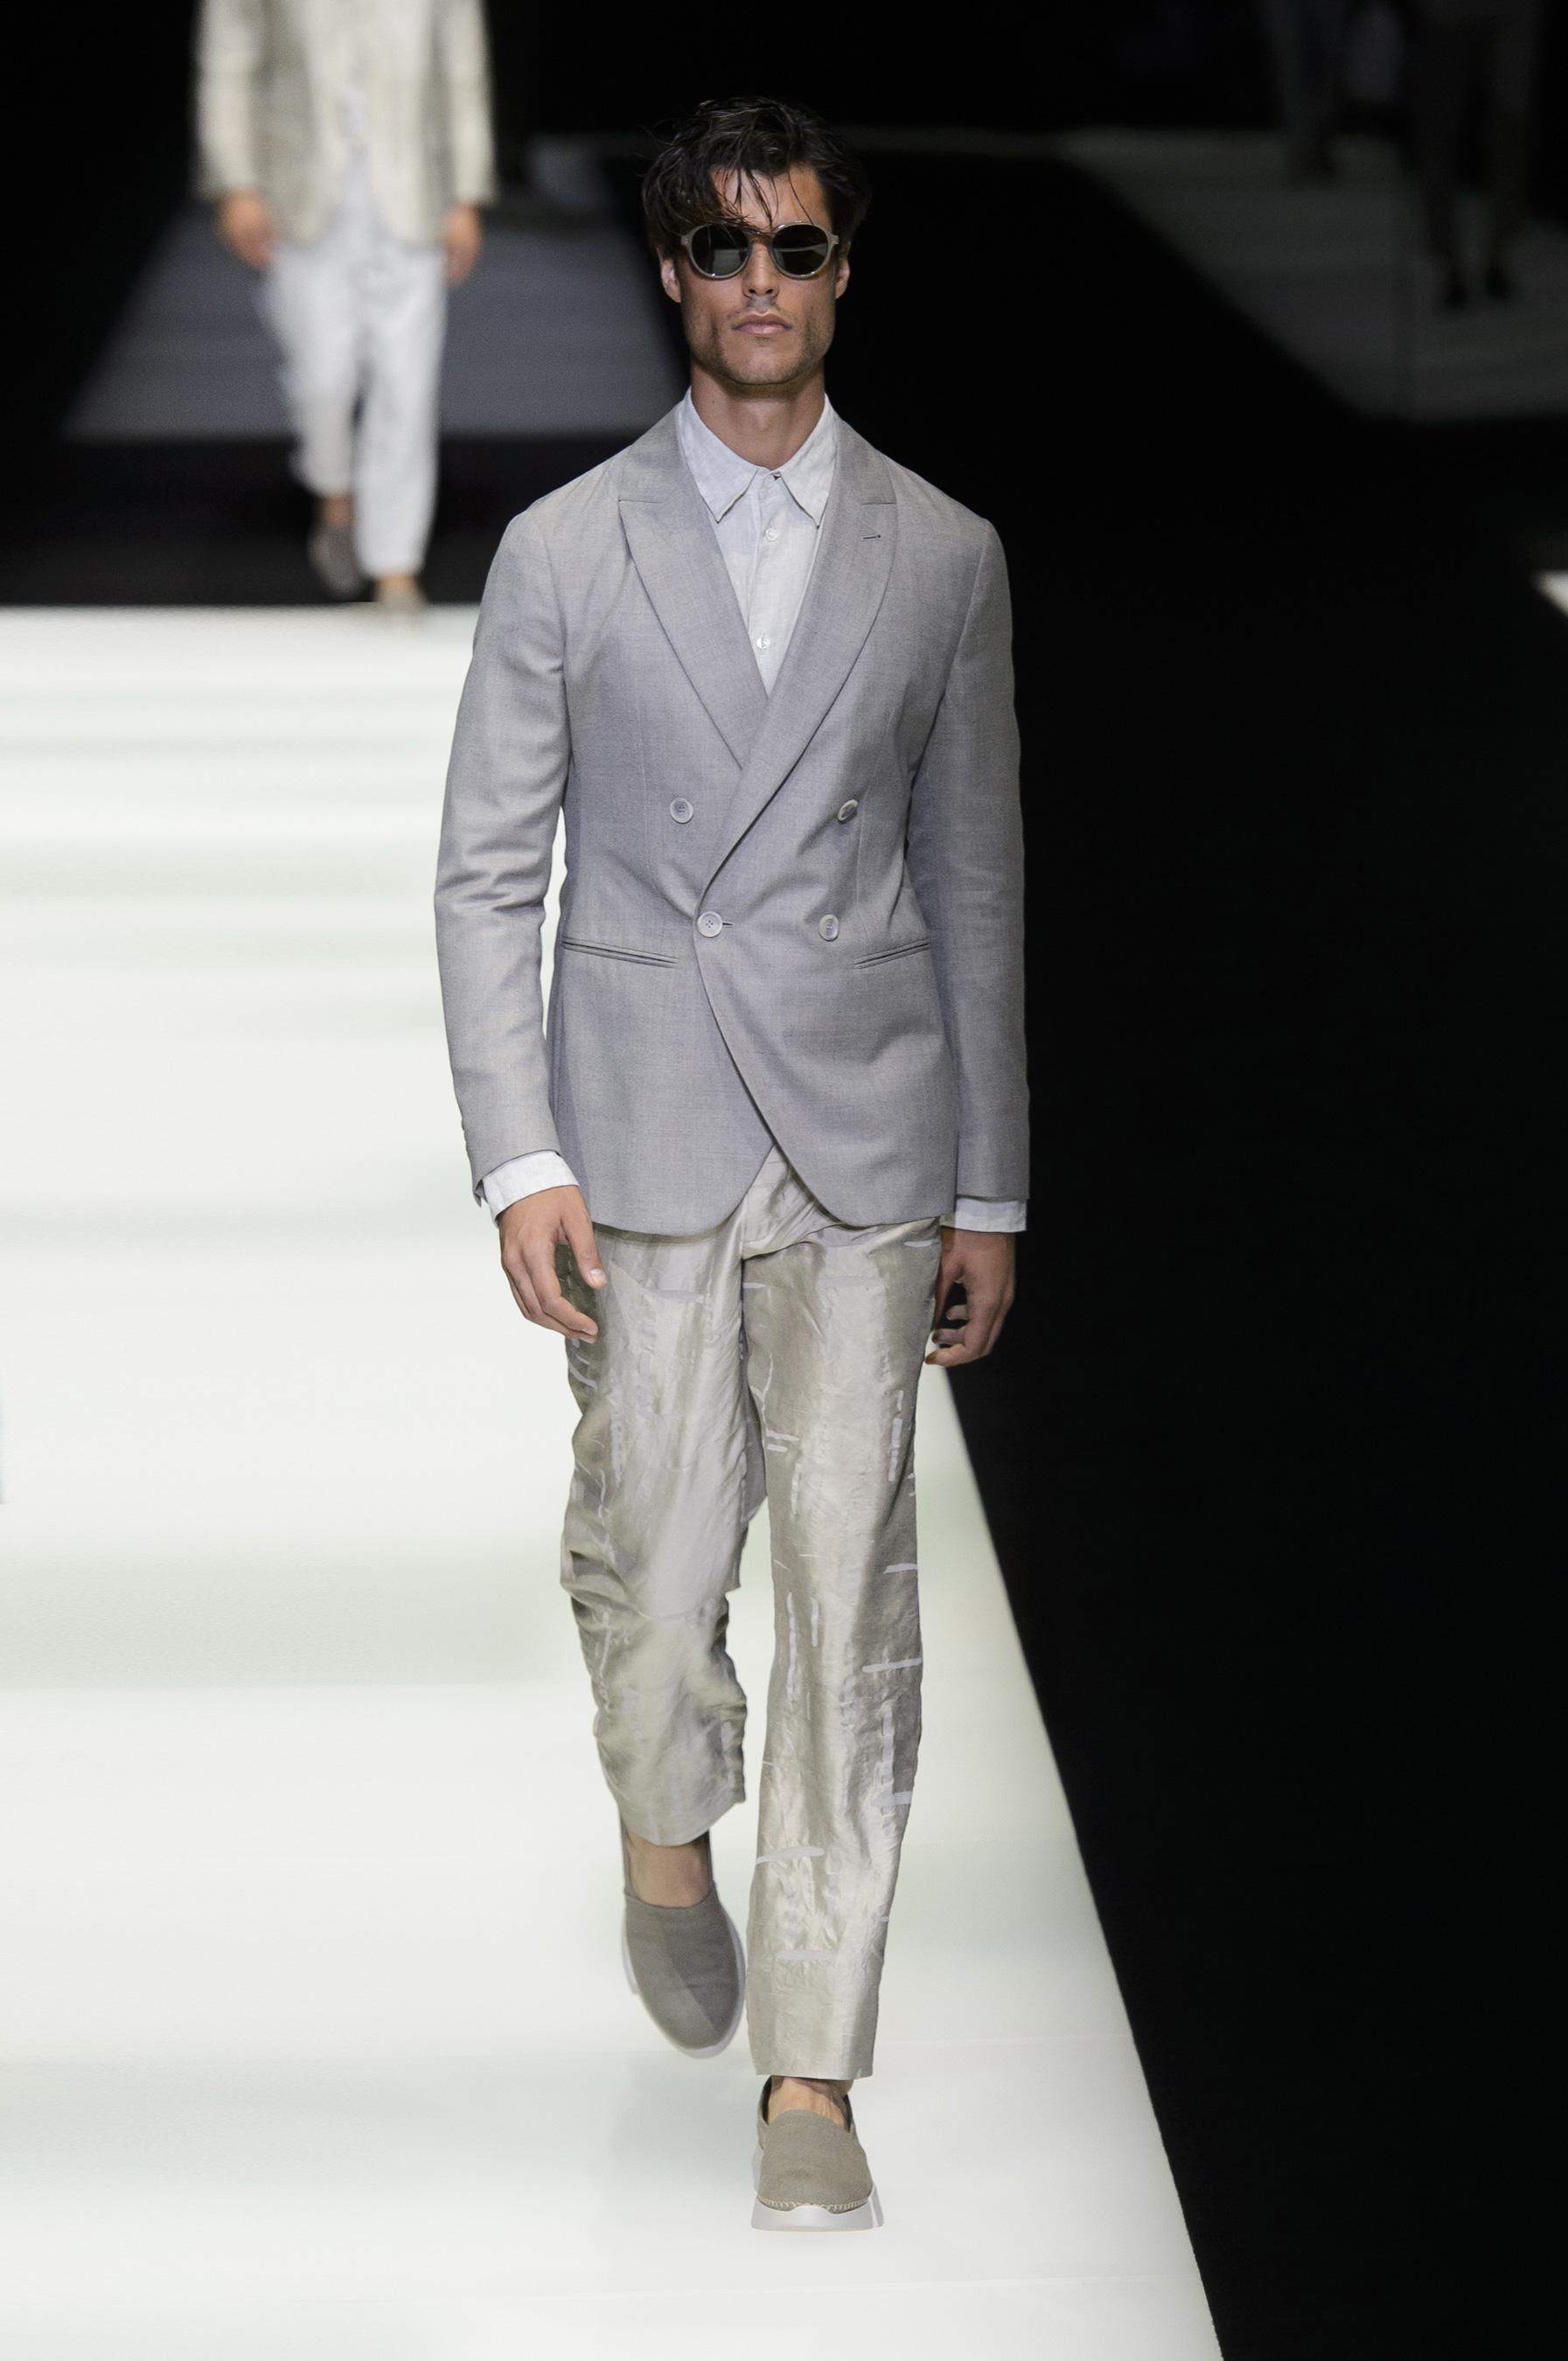 Giorgio Armani весна лето 2018 мужской костюм